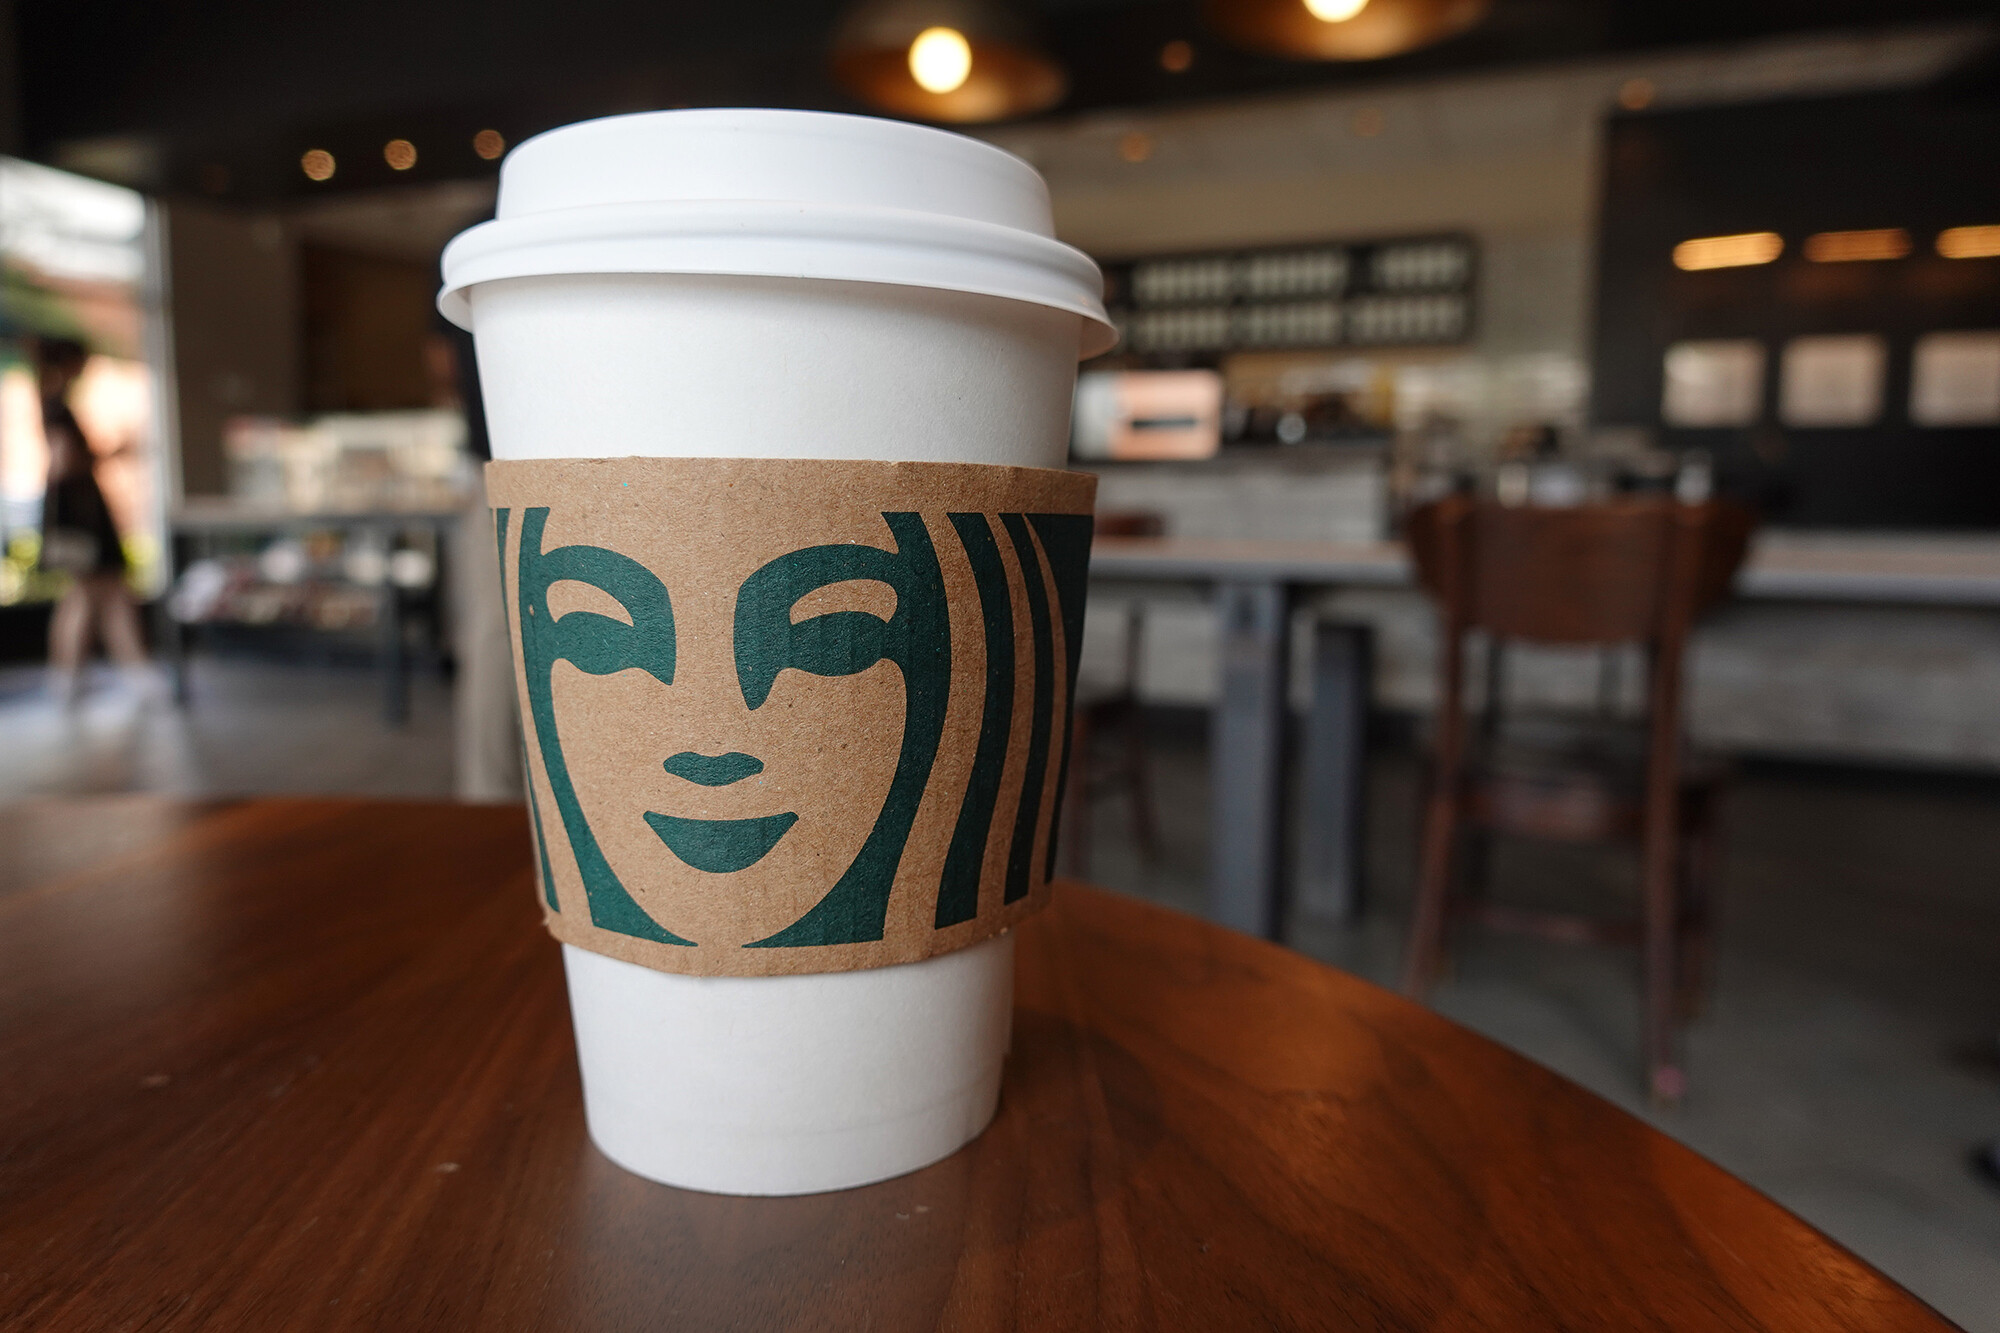 Here's when the Pumpkin Spice Latte returns to Starbucks